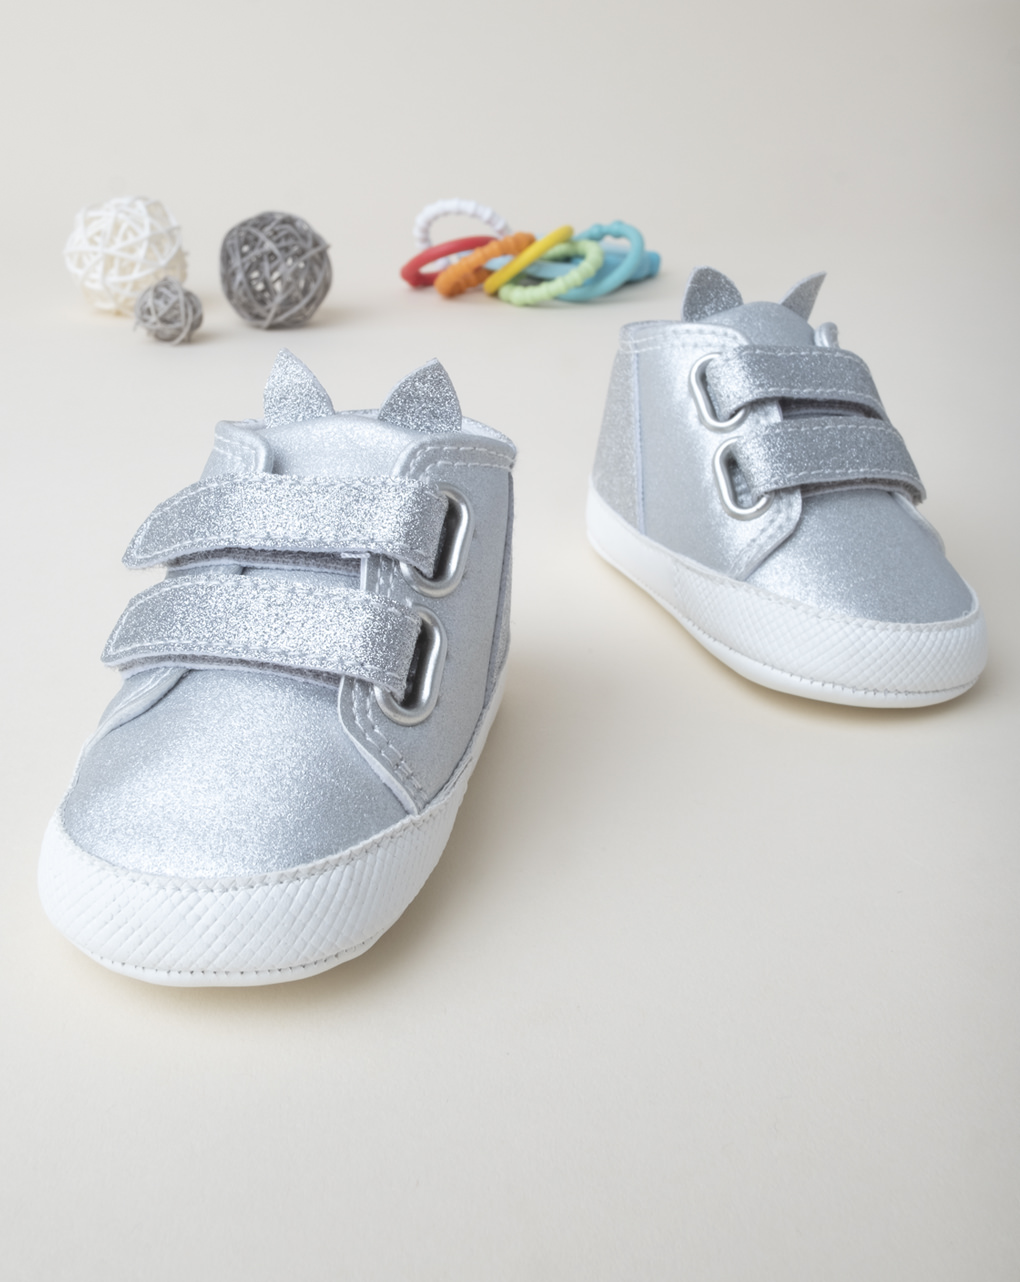 Scarpe girl glitter argento - Prénatal